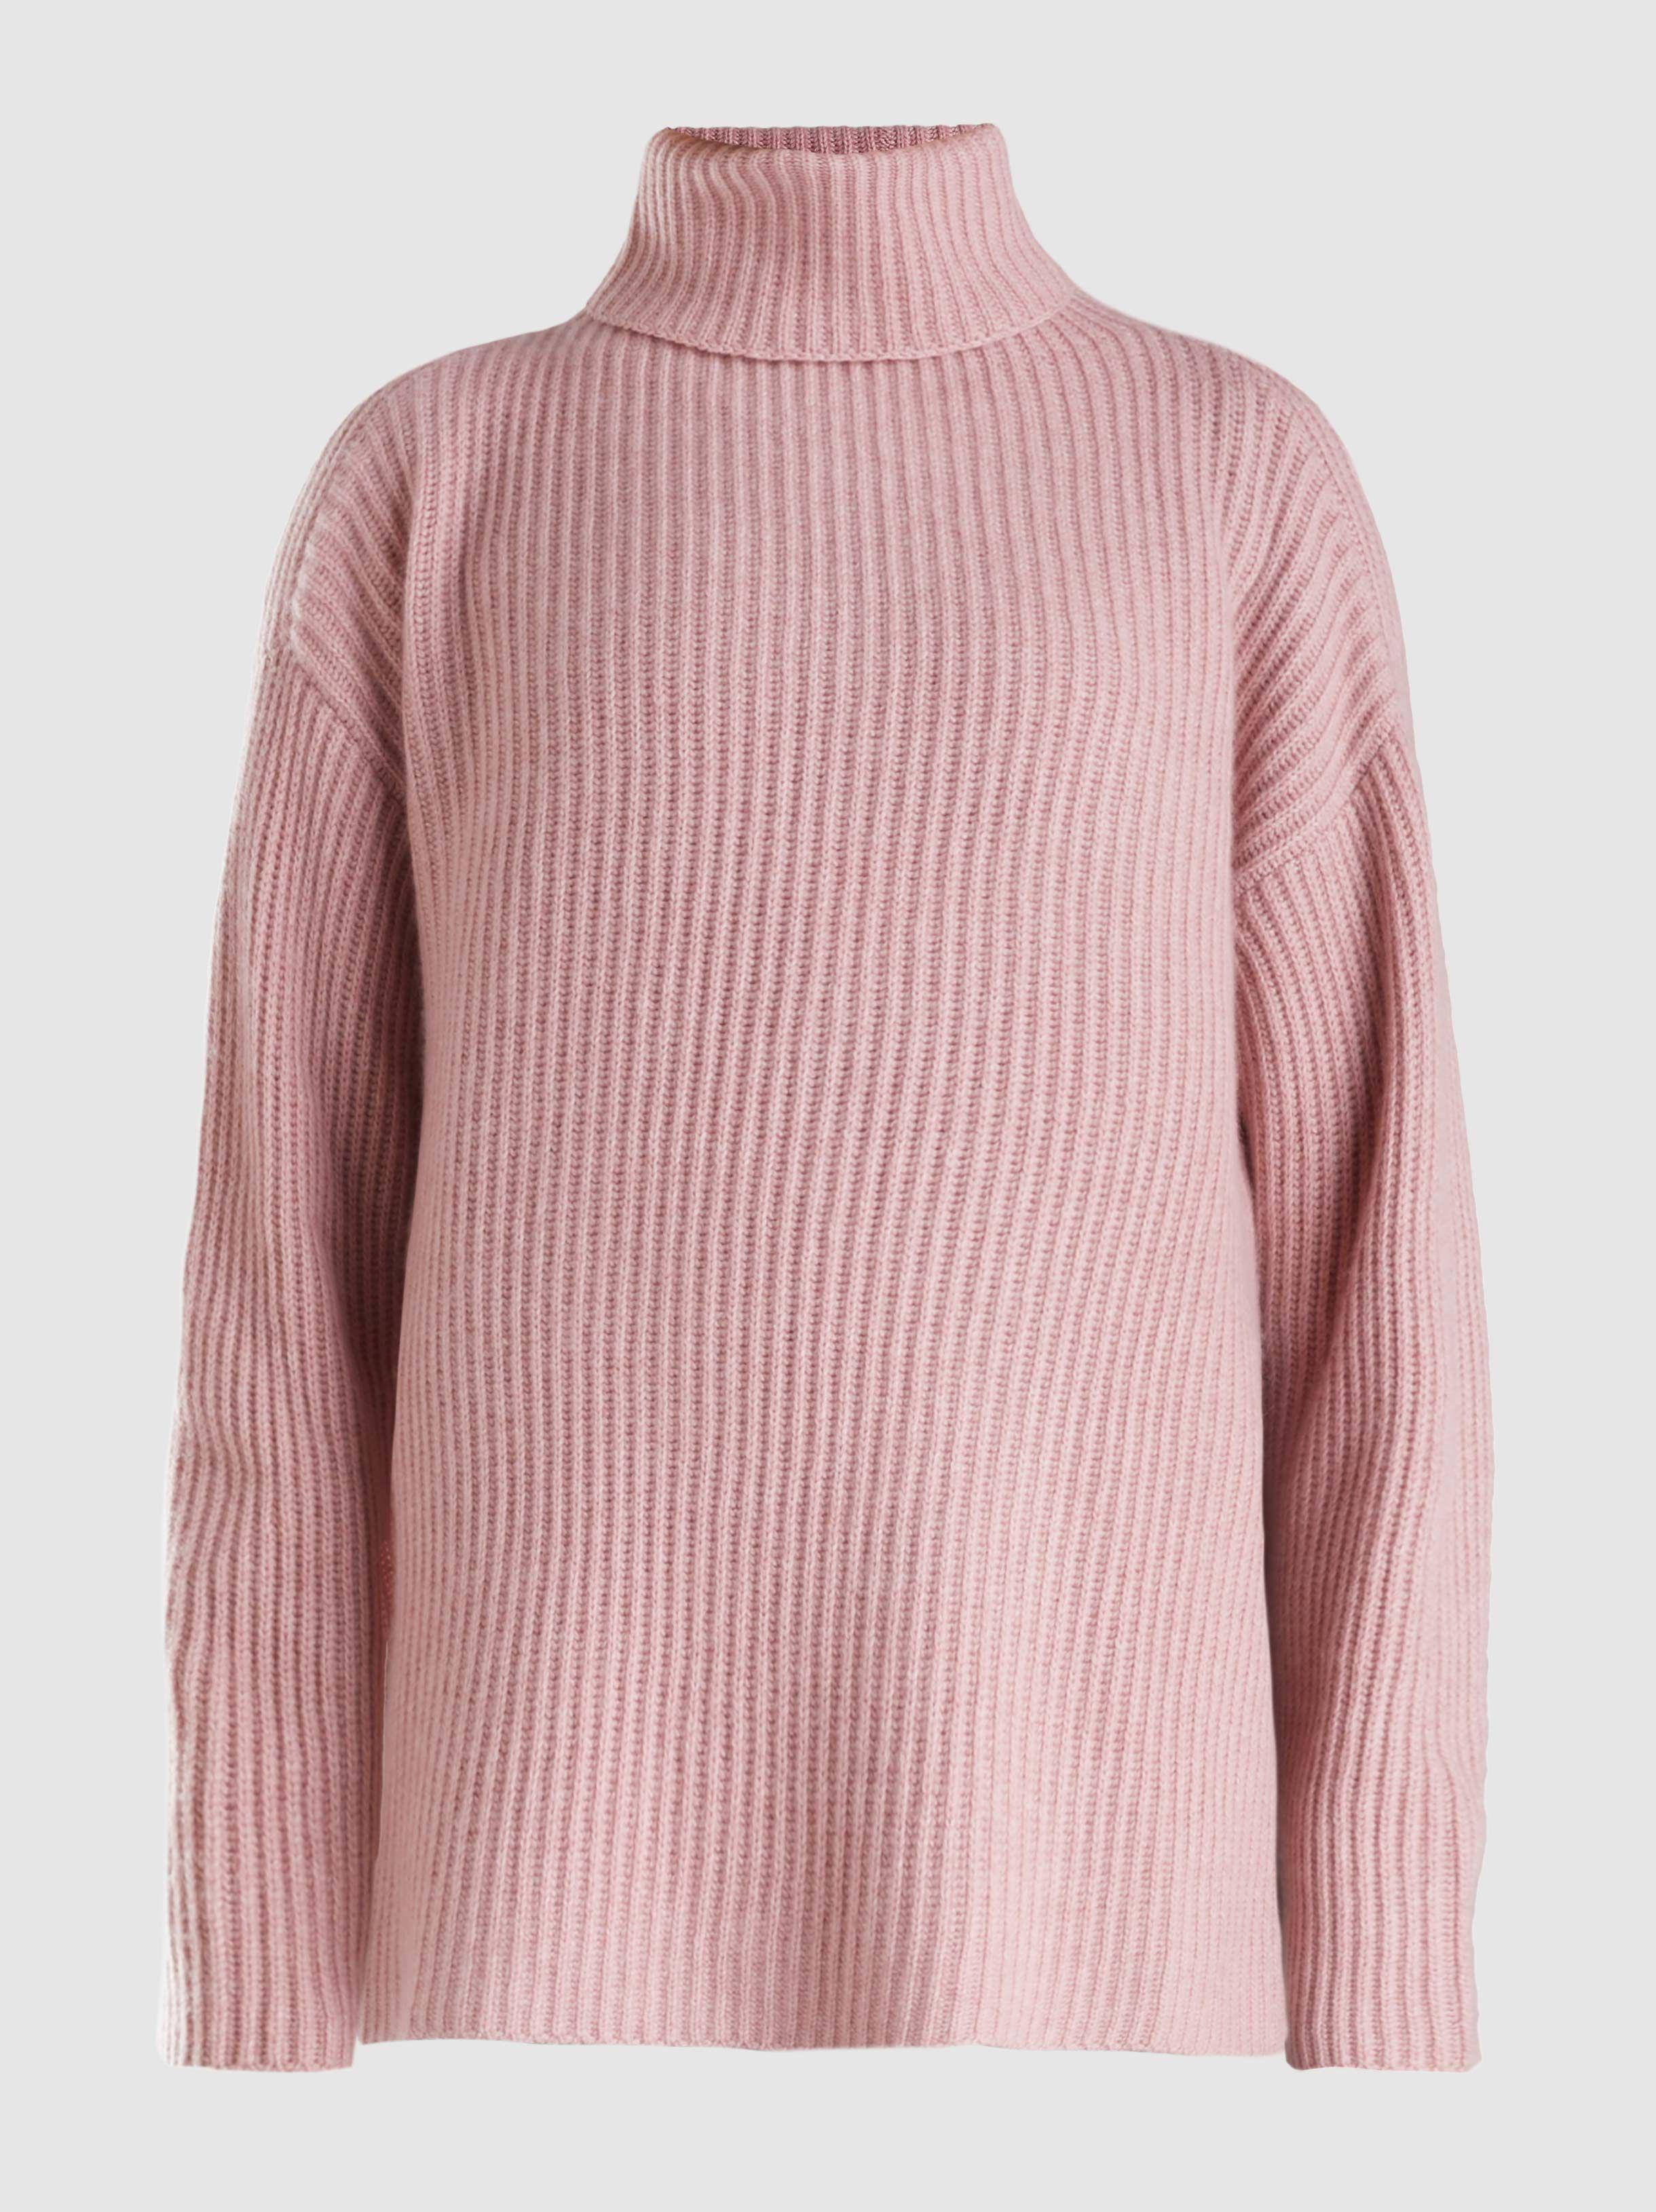 fce4755f1622c5 Tap to visit site. Le Kasha - Pink Lisbon Oversized Roll Neck Cashmere  Sweater - Lyst